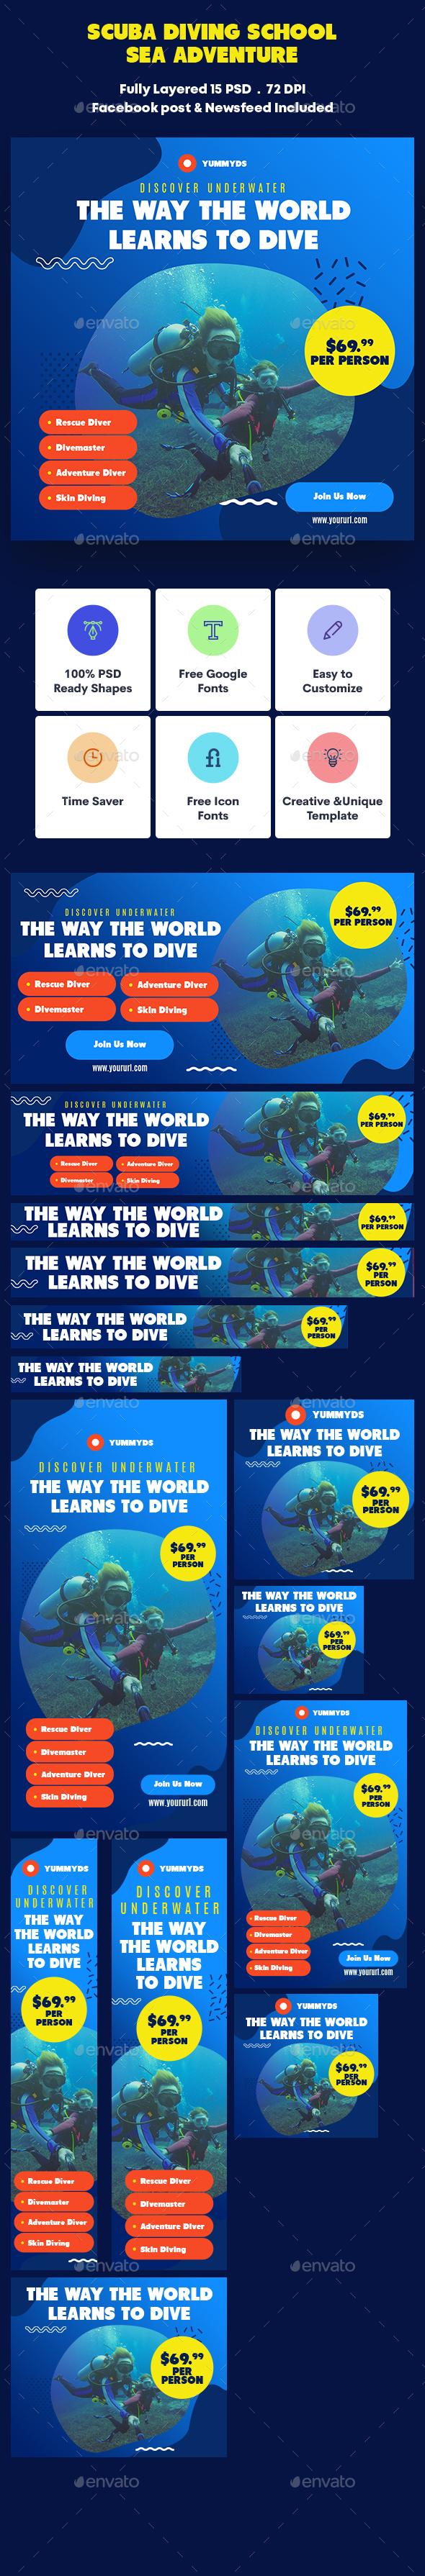 Scuba Diving School & Sea Adventure Banners Ad